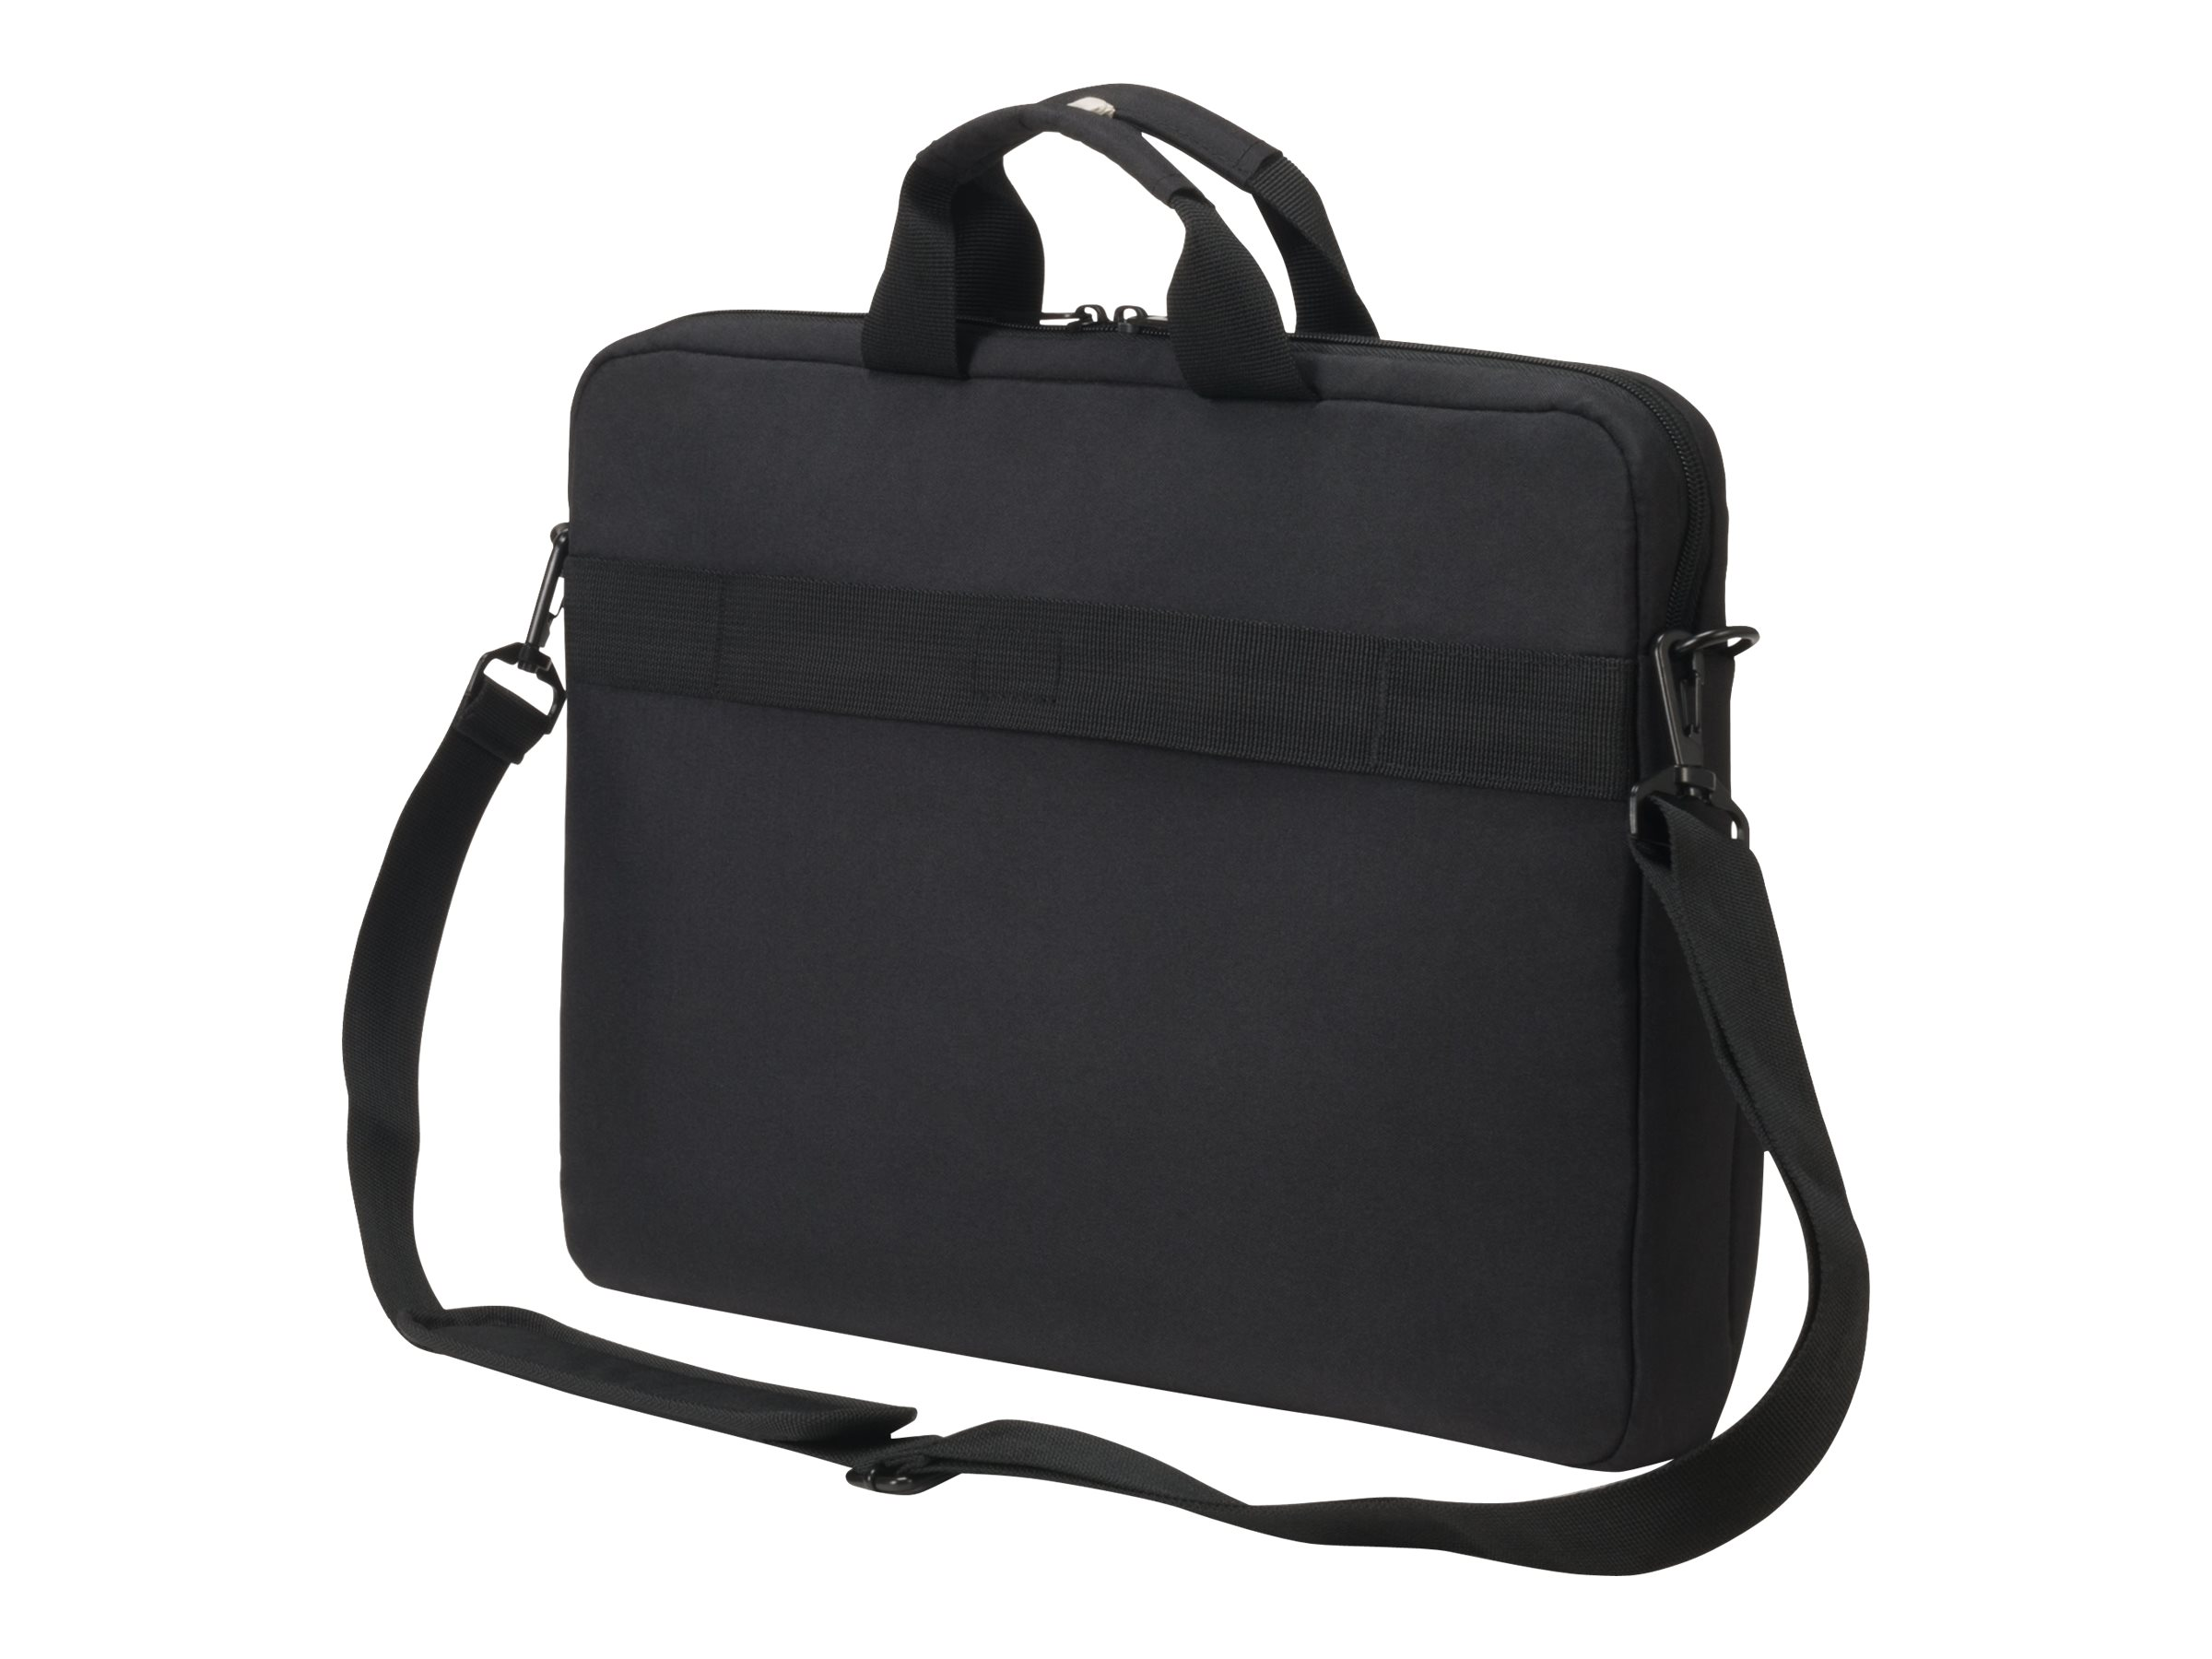 Dicota Eco - Notebook-Tasche - 39.6 cm - 13